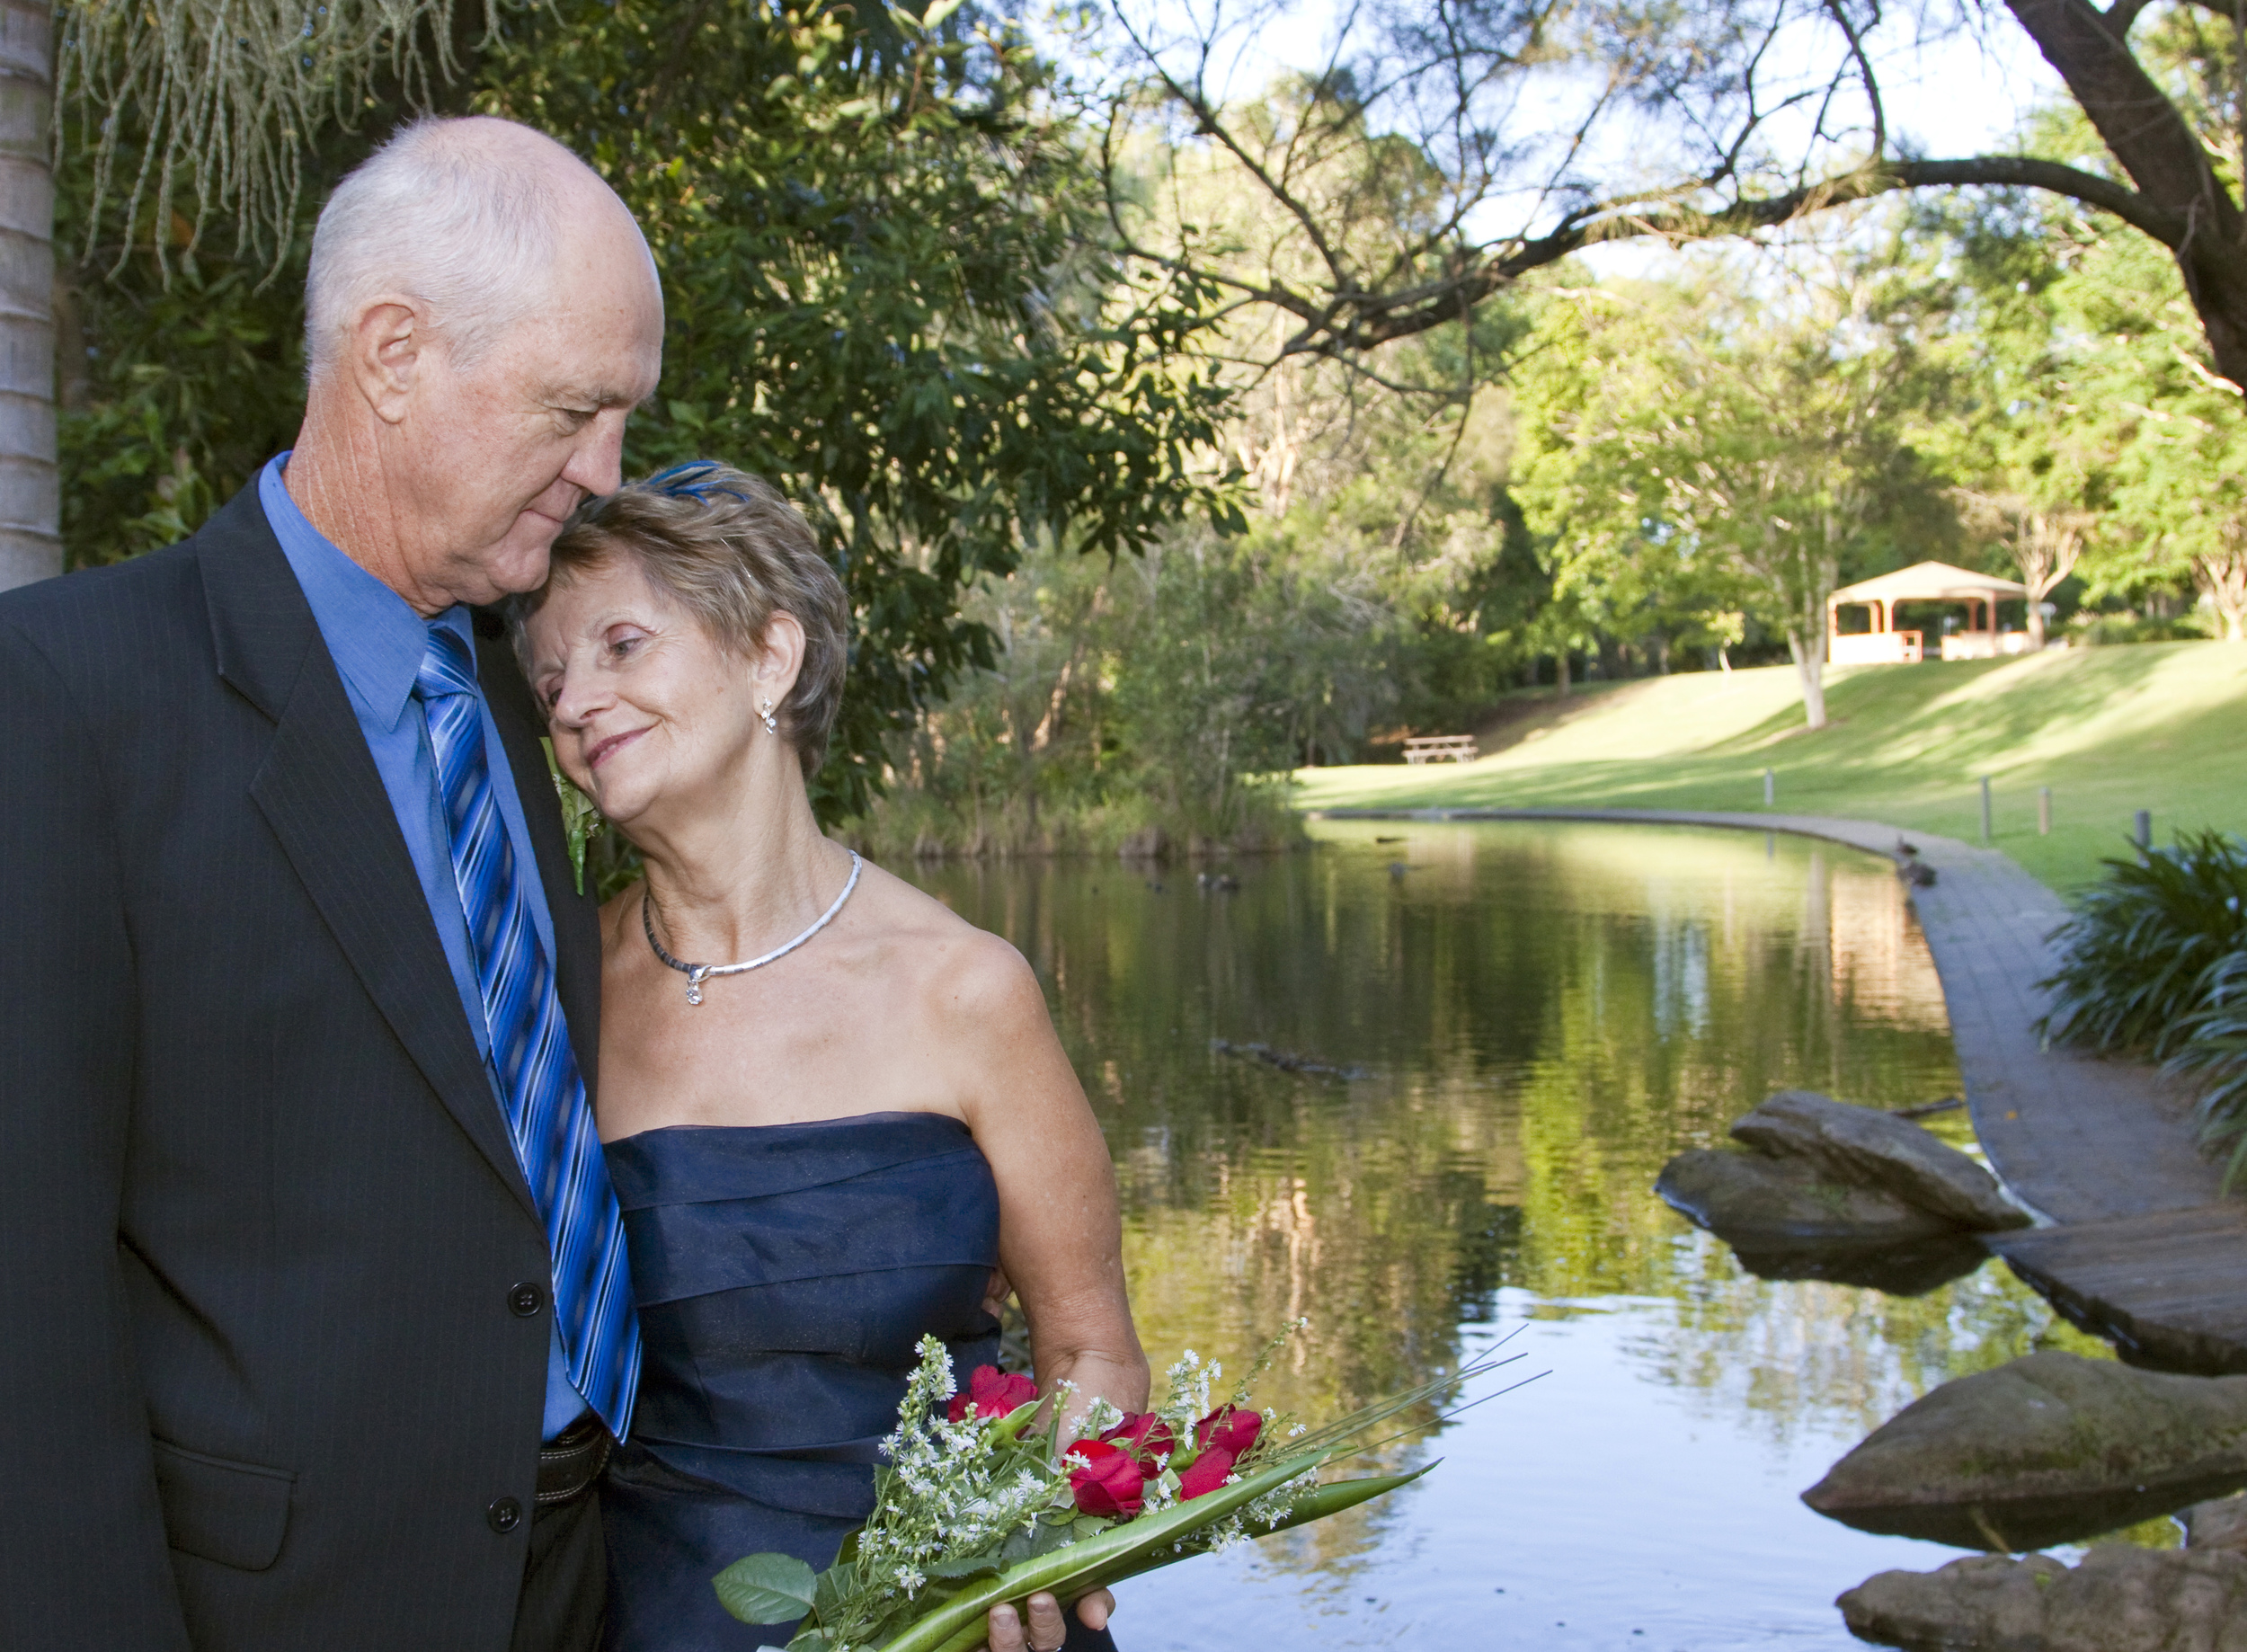 Brian and Yvonne_0001.jpg